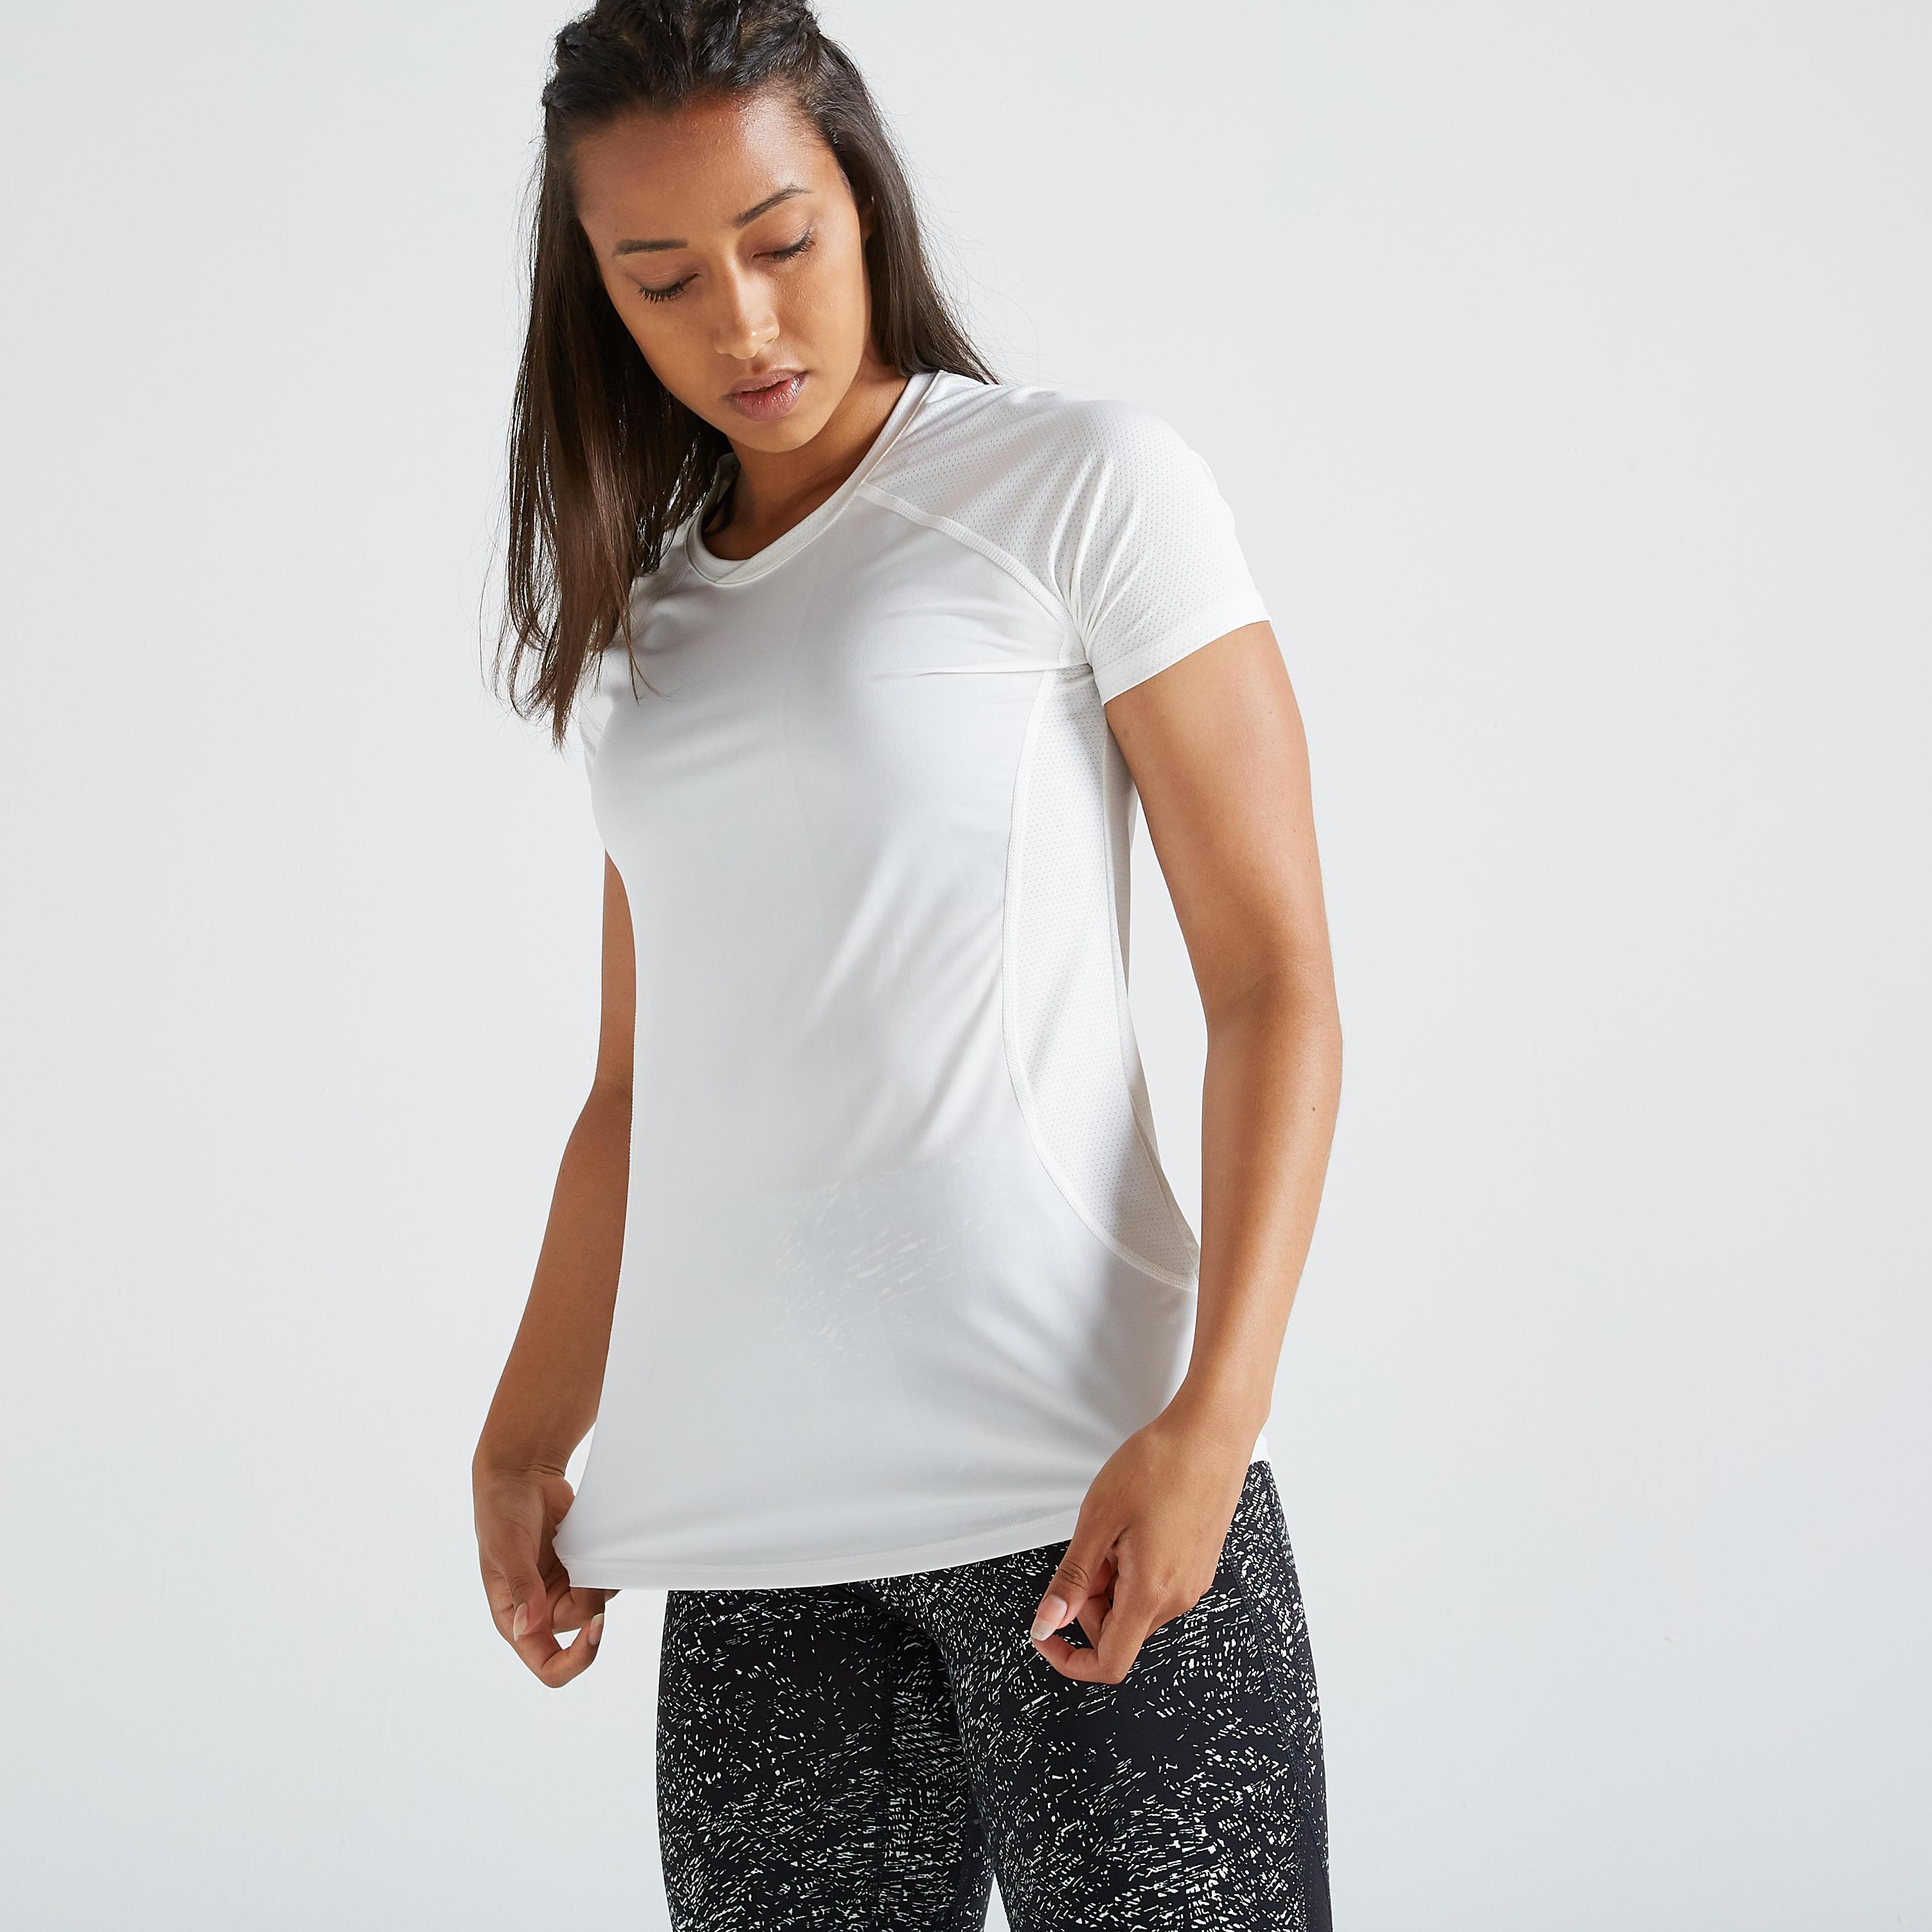 T-Shirt FTA 500 Cardio-/Fitnesstraining Damen weiß | Sportbekleidung > Sportshirts > T-Shirts | Weiß | Domyos